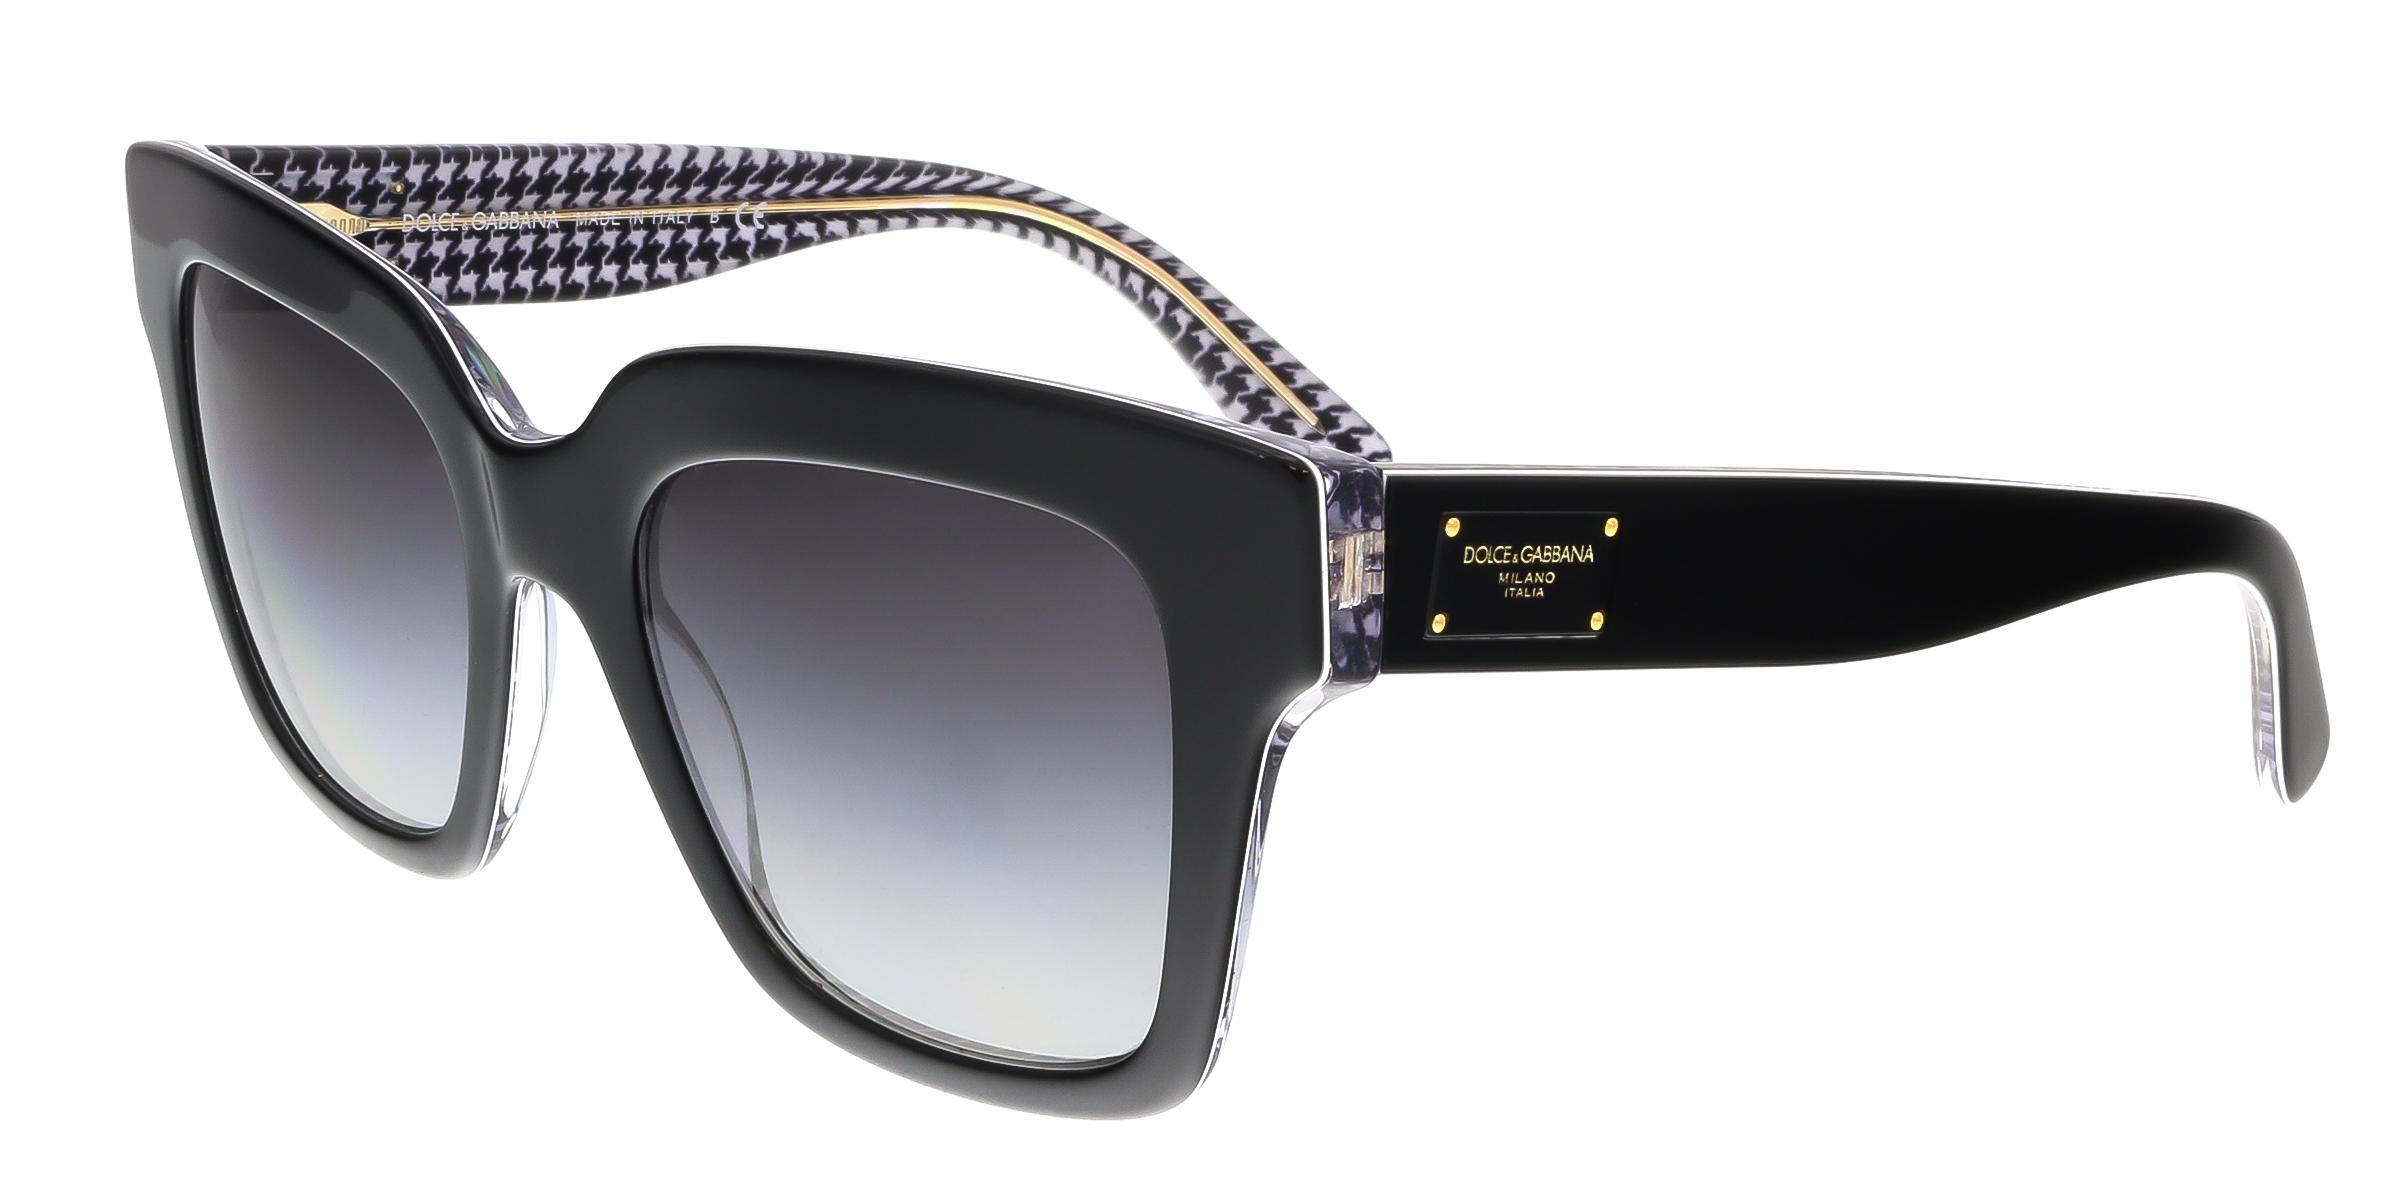 Dolce & Gabbana DG4286 30808G Black Square Houndstooth Sunglasses